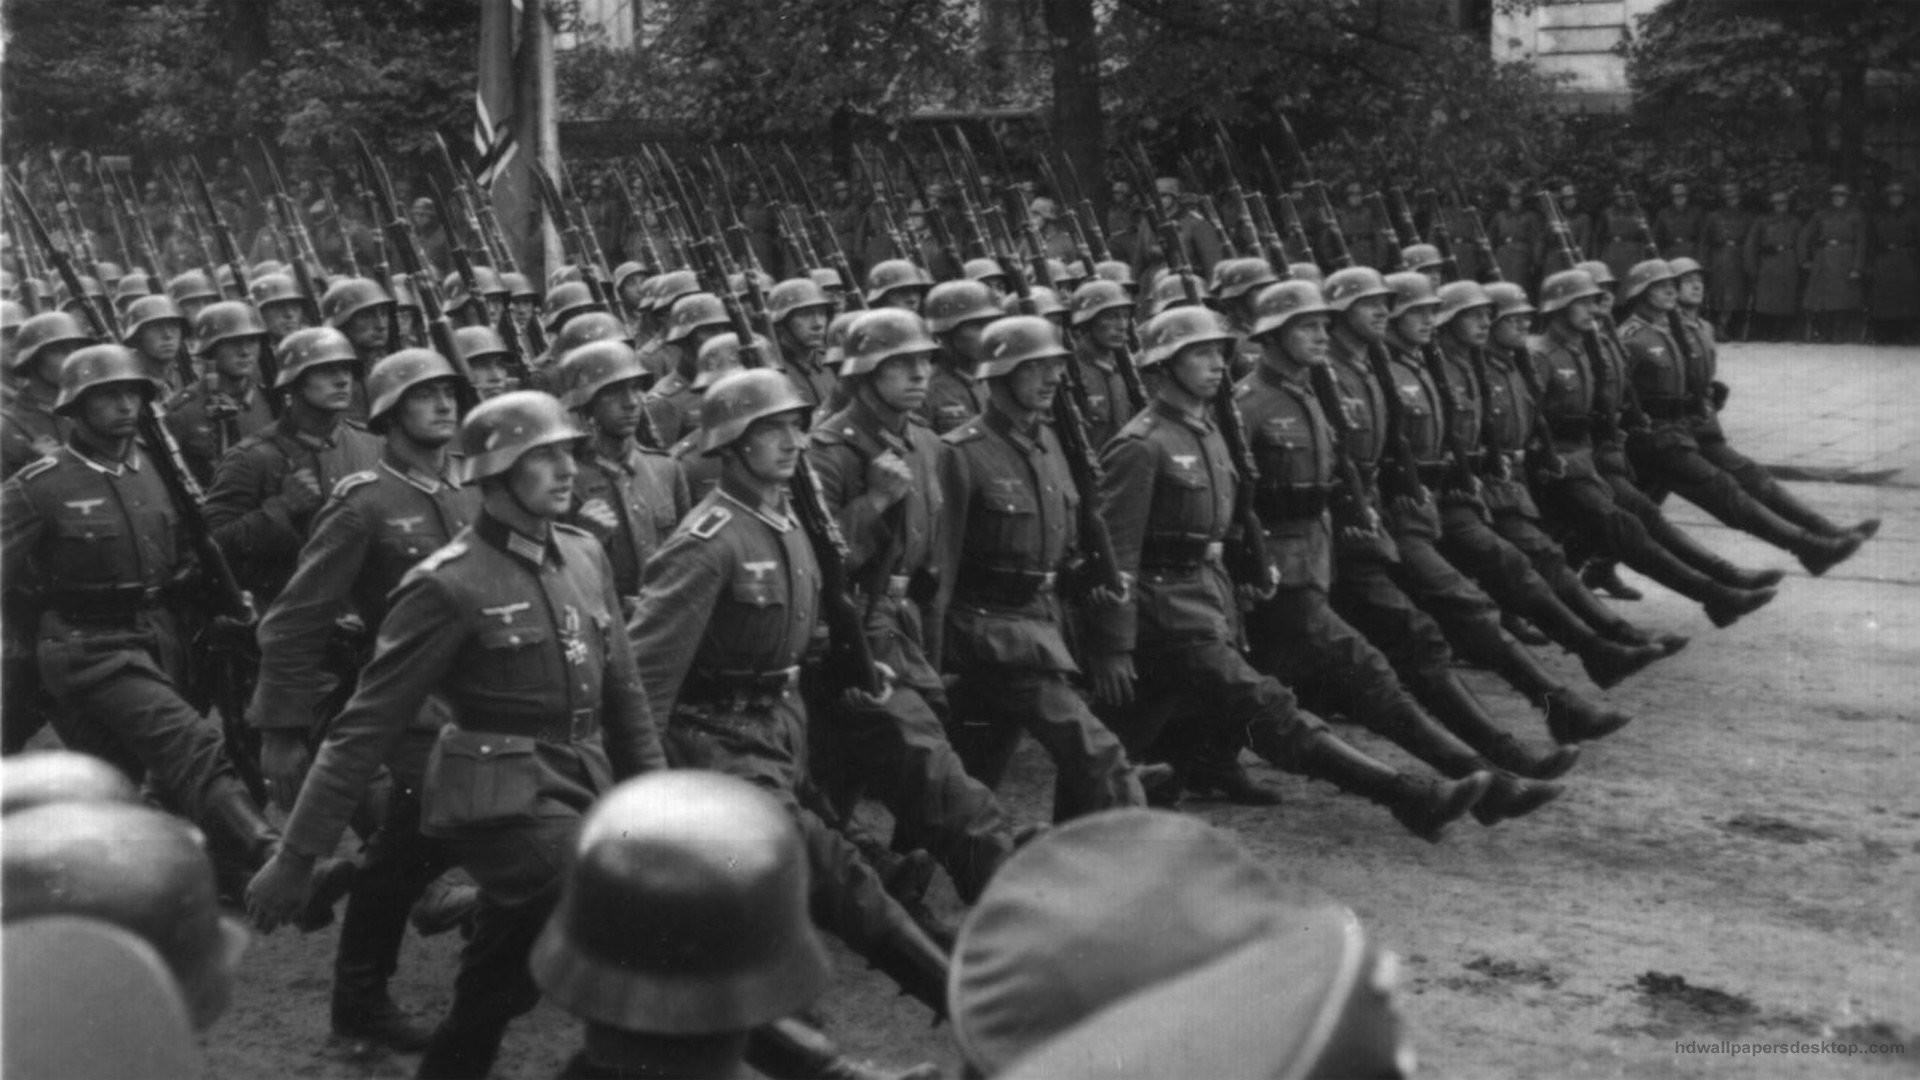 Nazi Military World war ii HD Wallpapers, Desktop Backgrounds 1920×1080